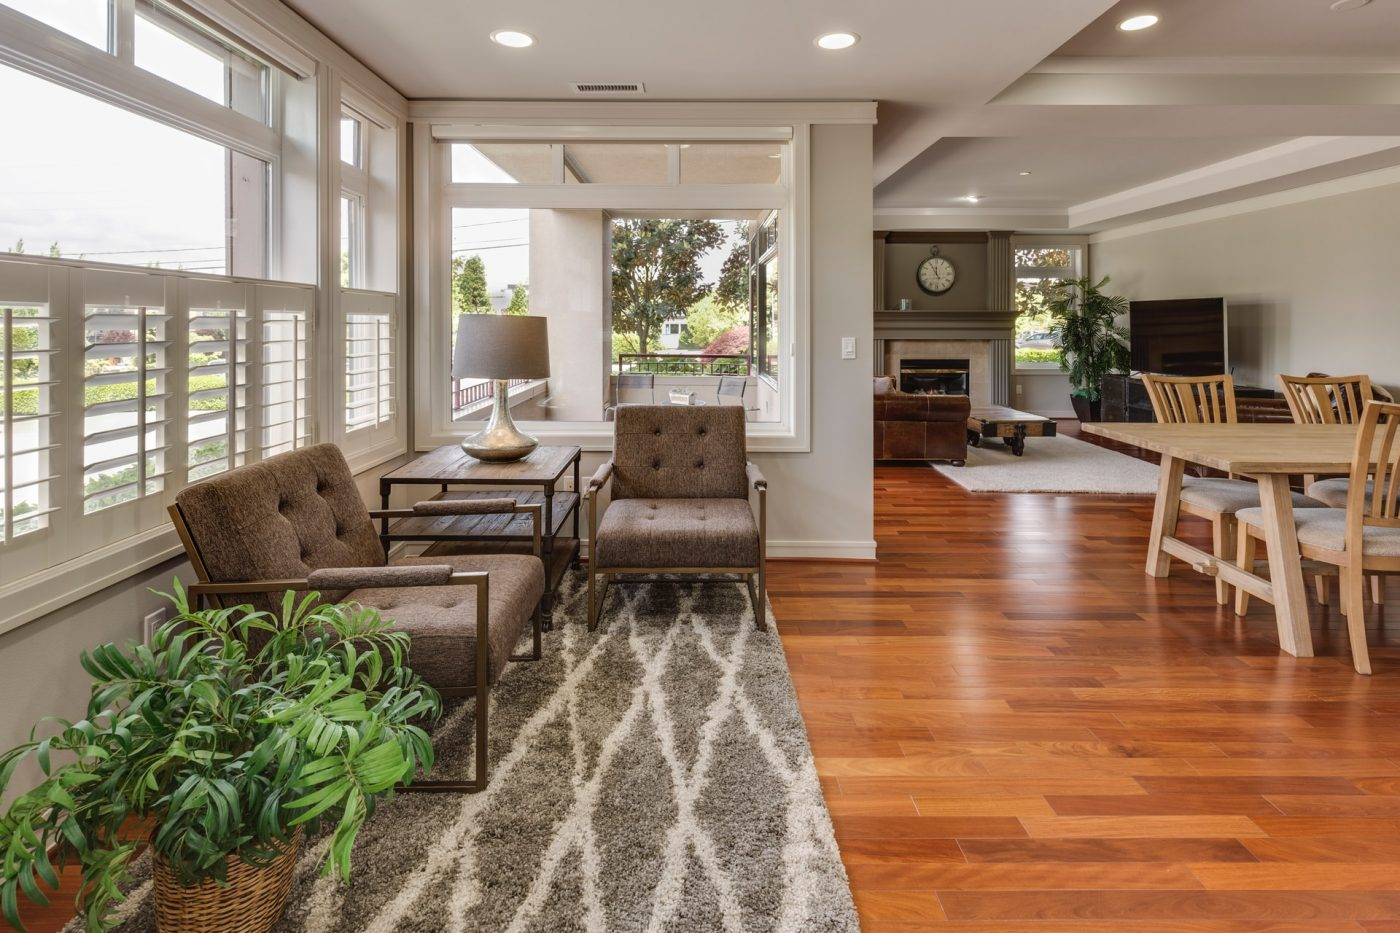 Tipos de suelos para casas modernas